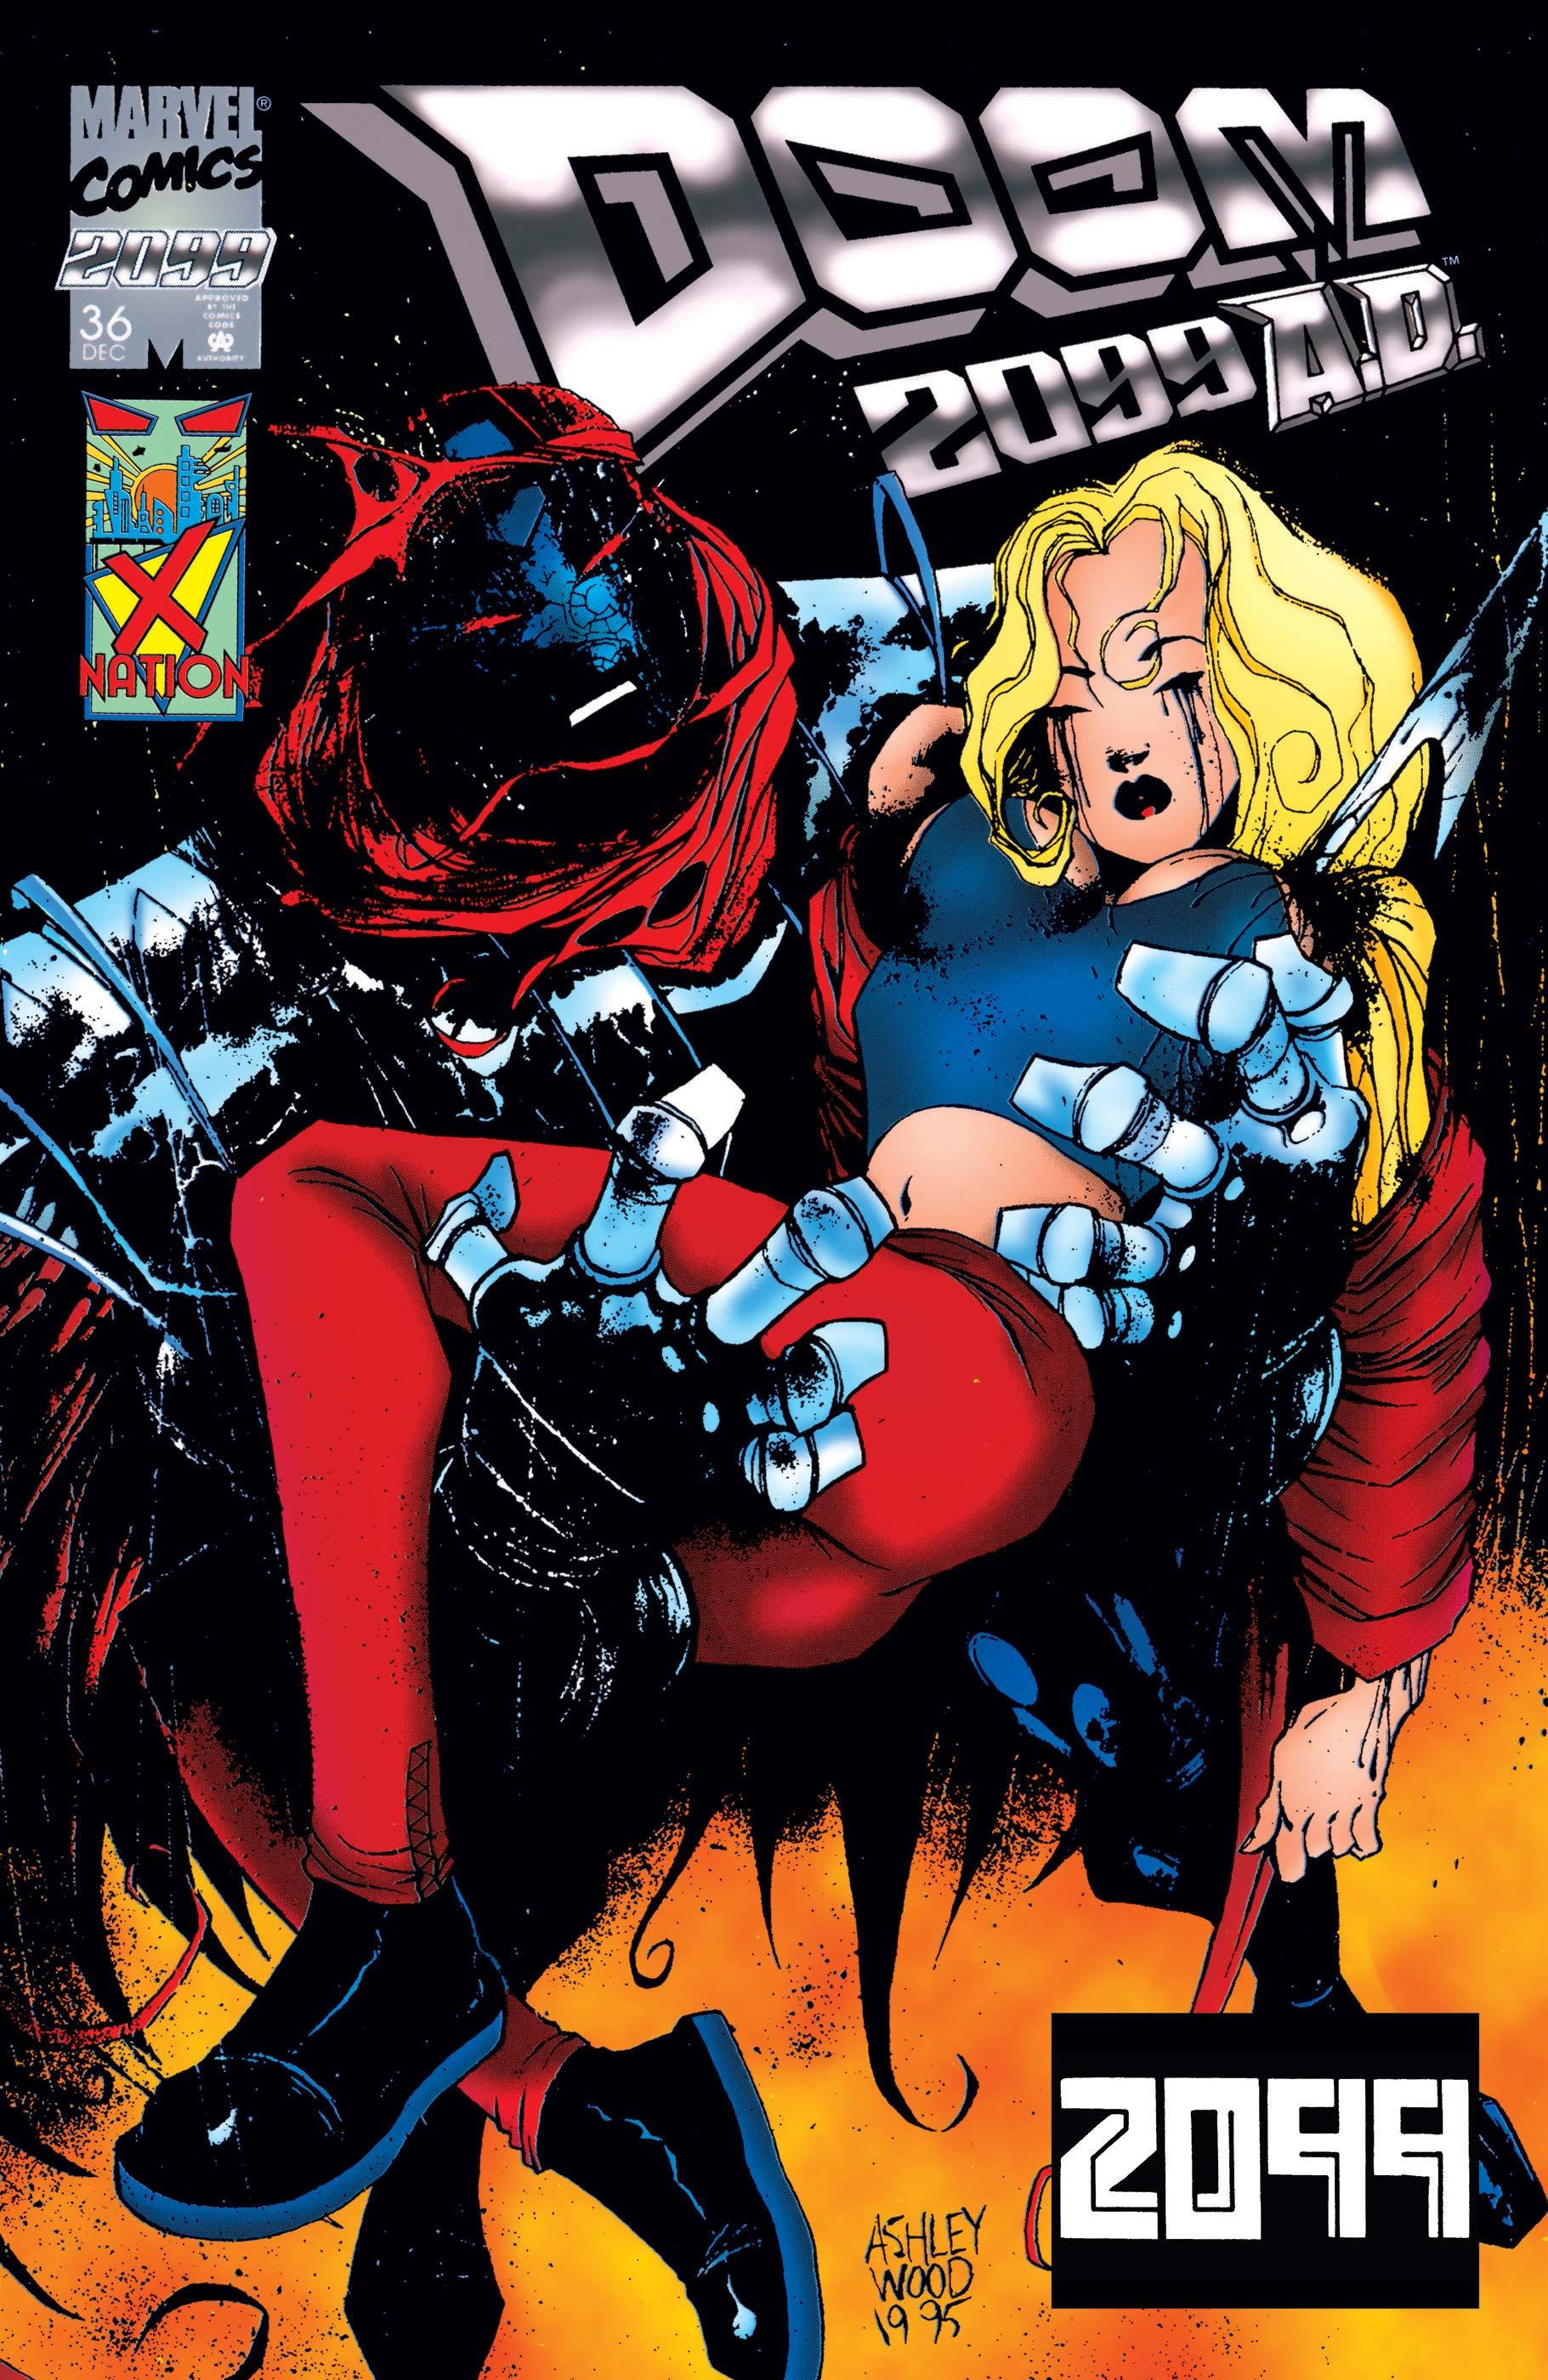 Doom 2099 (1993) #36